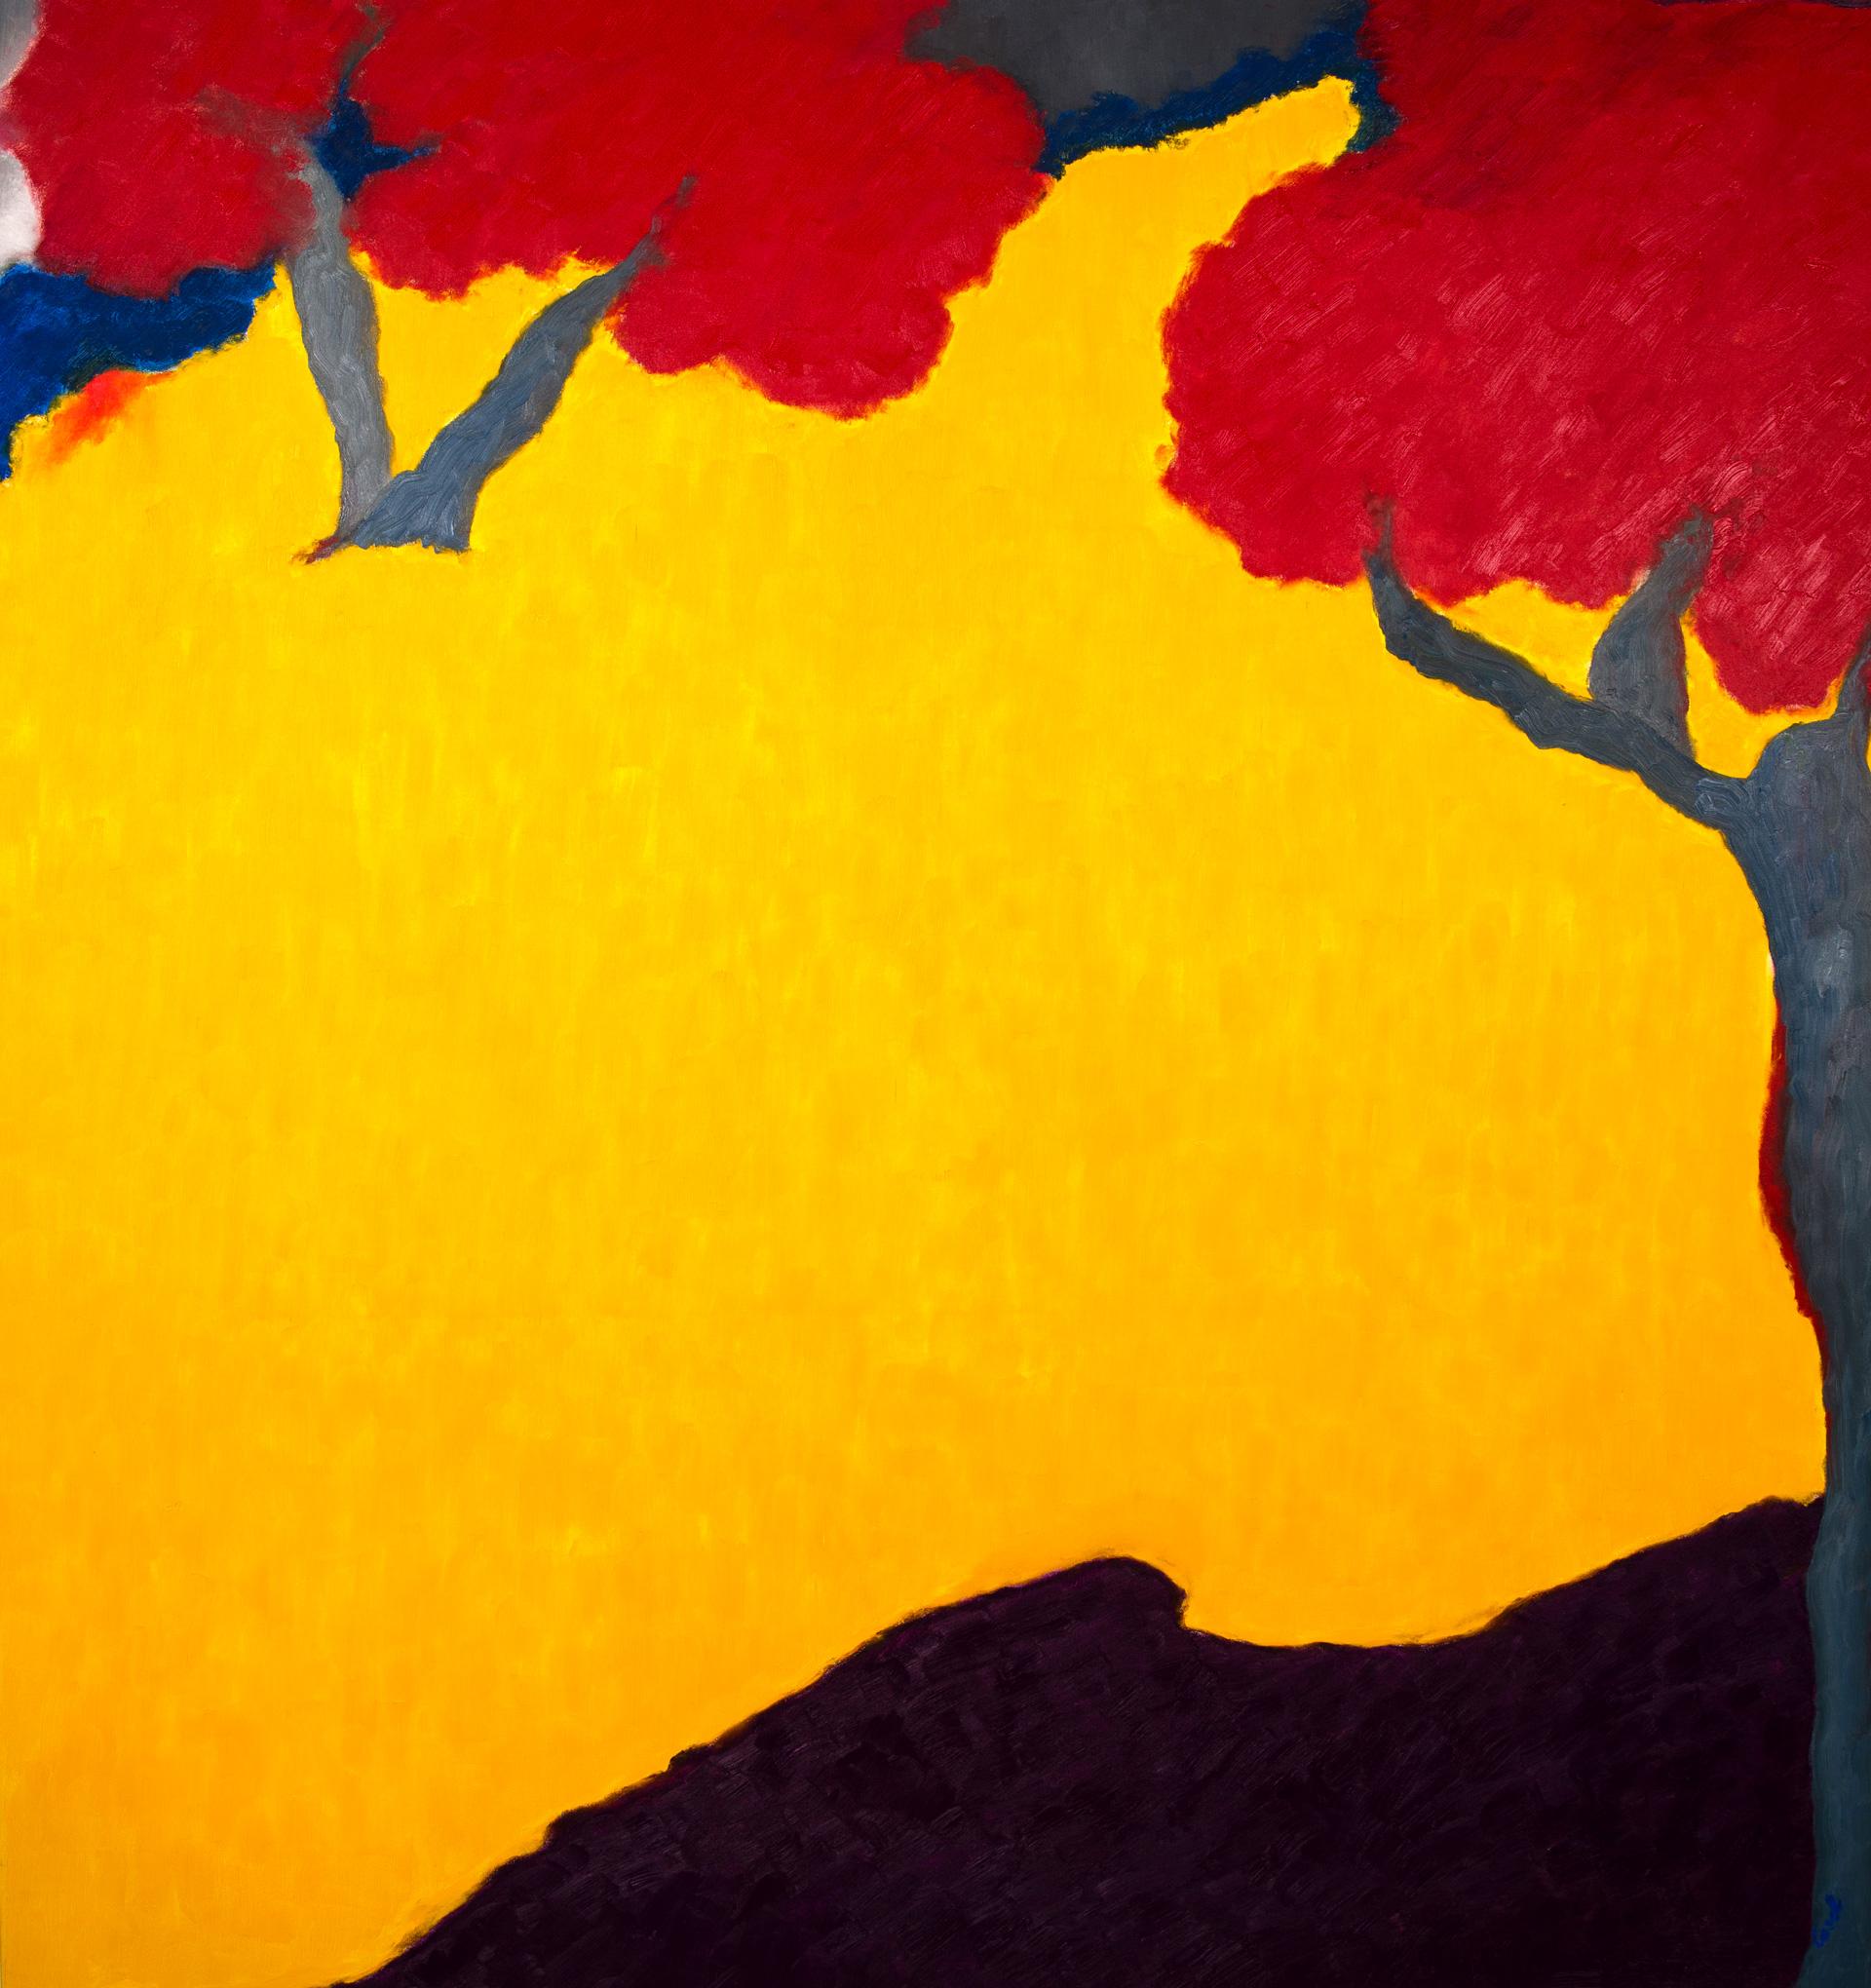 Maryse Casol, painting Ceci N'est Pas Un Arbre III, 2010